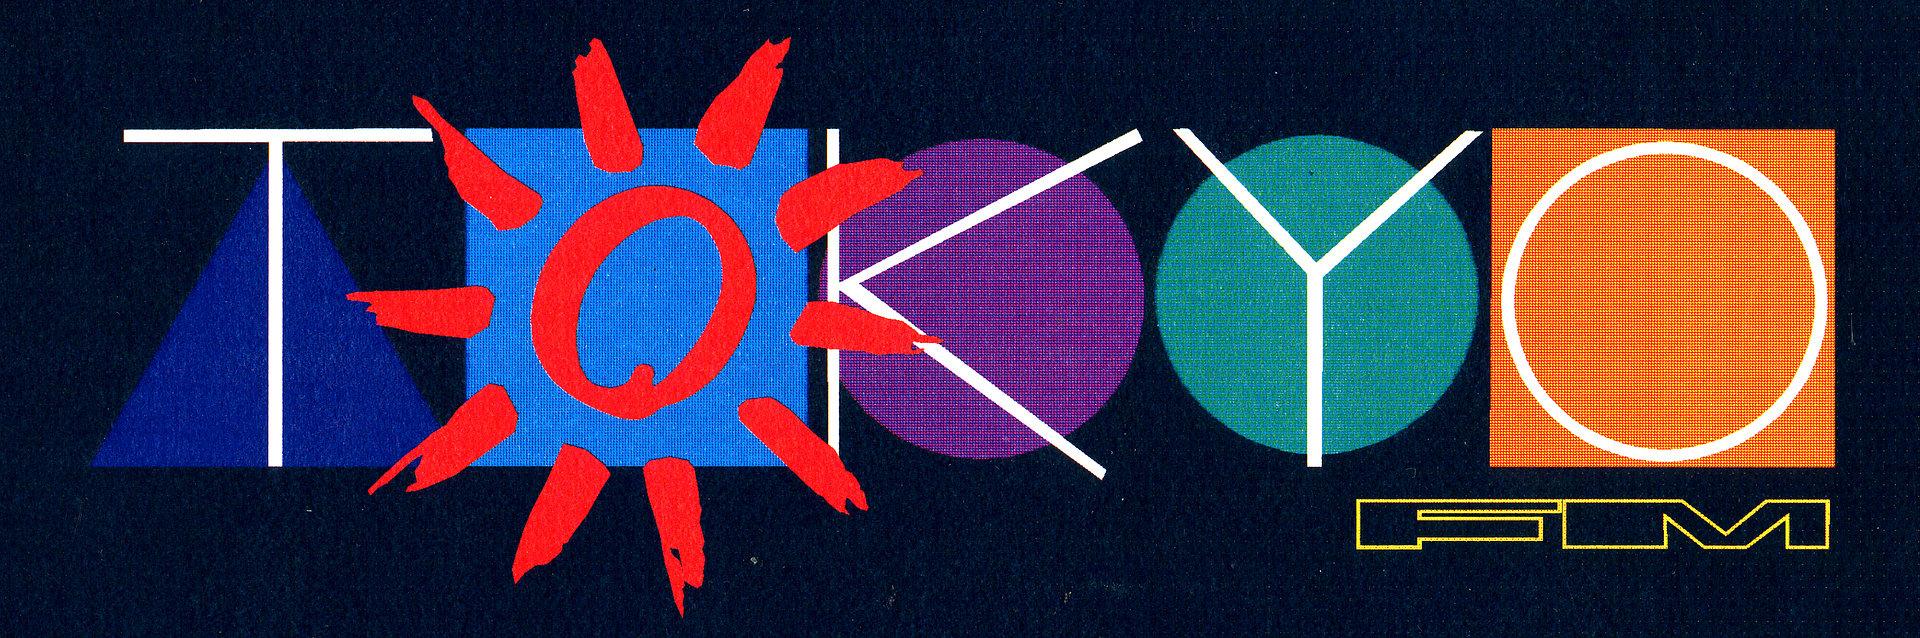 TokyoFM Japanes Radio Station Logo